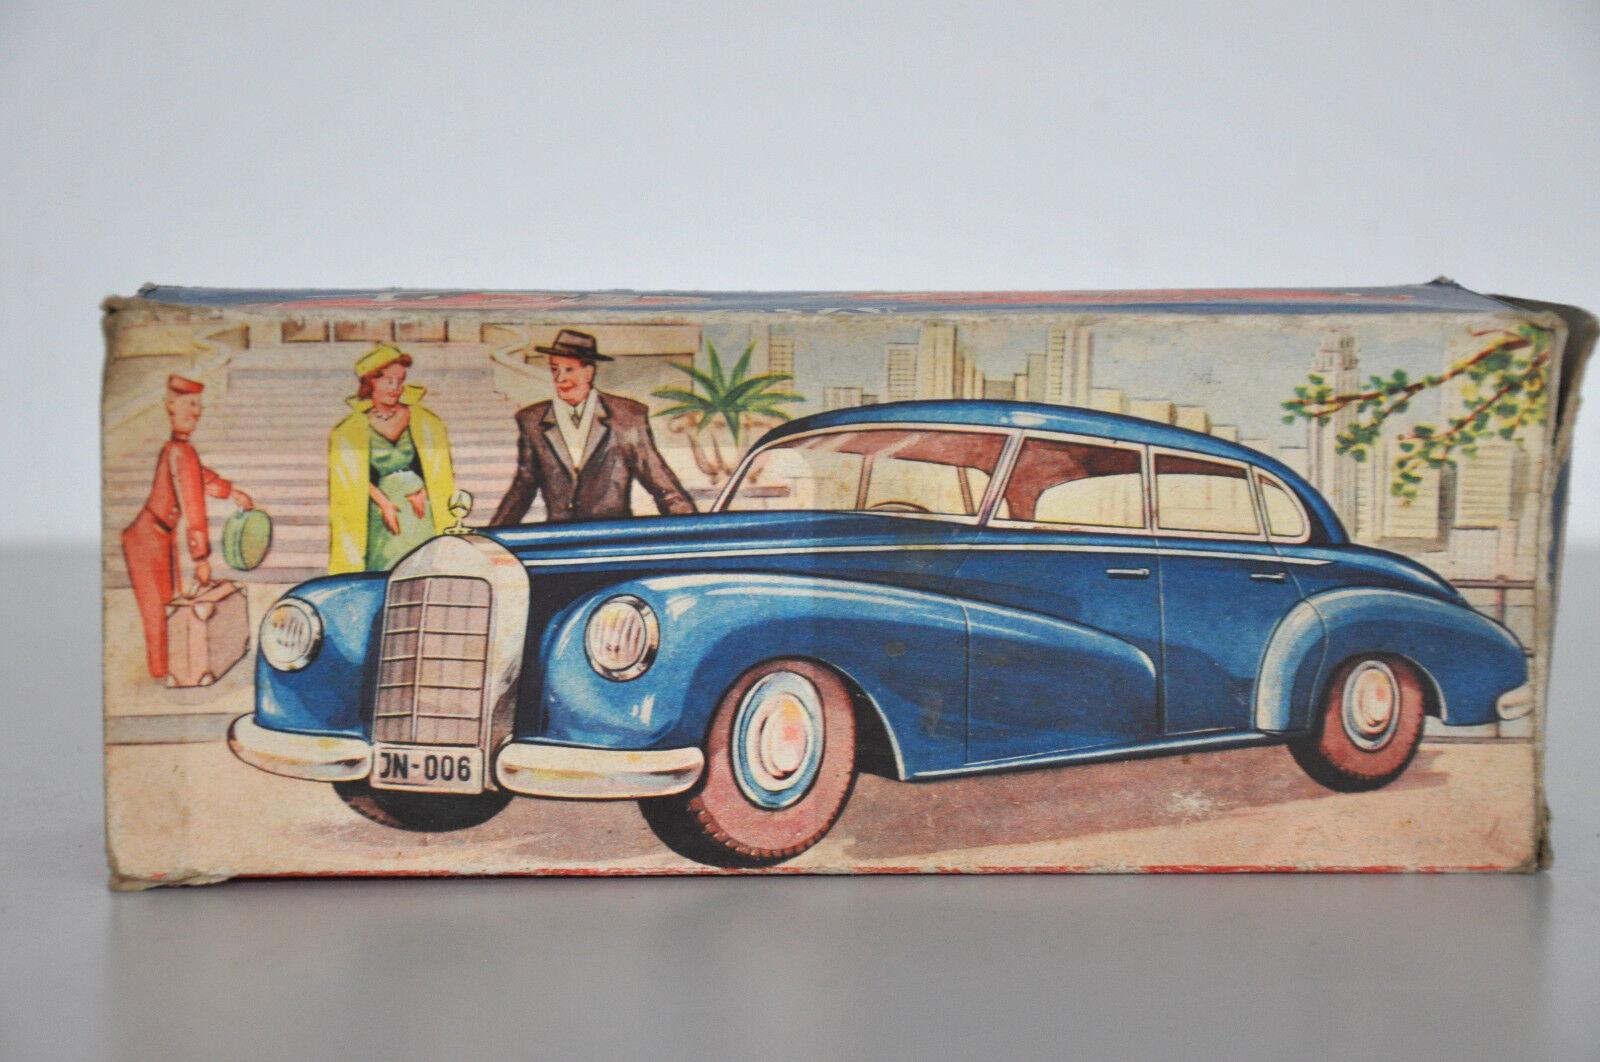 JNF Benz M300 Mercedes Benz JNF Blechspielzeug in Reprobox Nr. 67 13f873